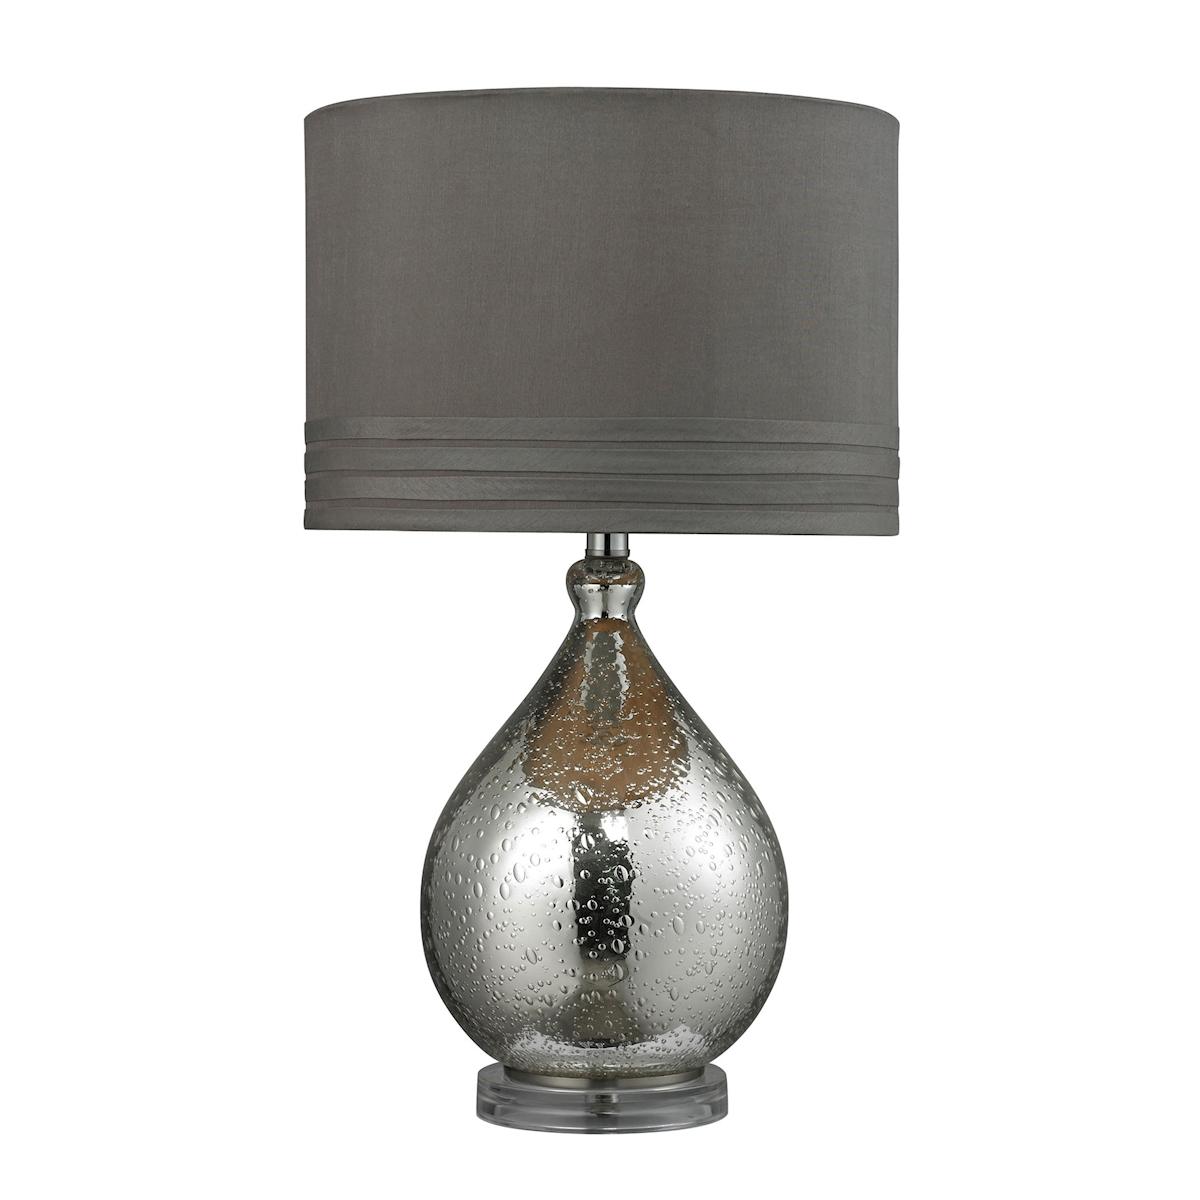 Dimond HGTV 24 Bubble Glass Table Lamp in Mercury Glass